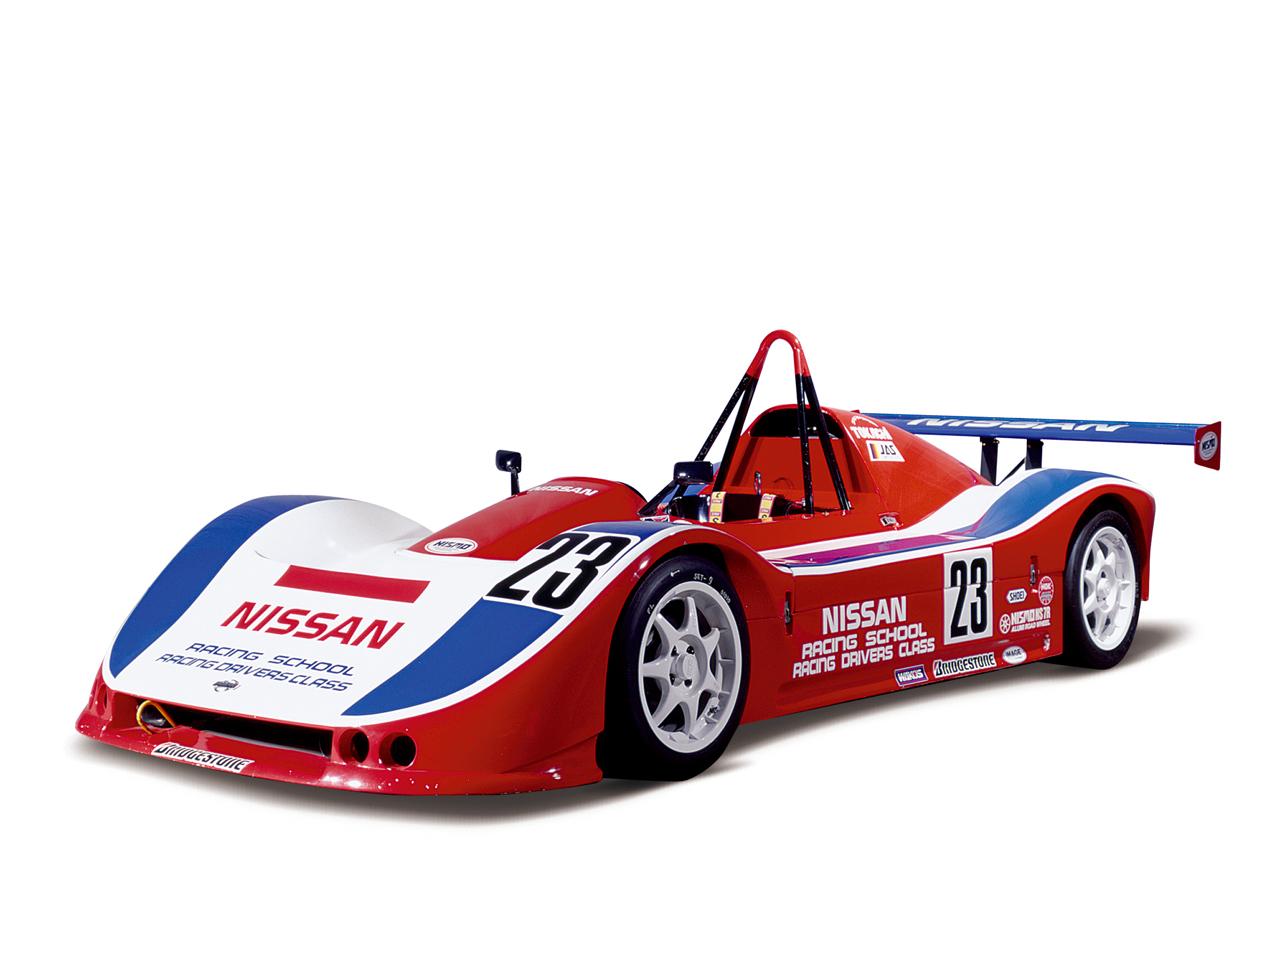 nissan future race car - photo #12